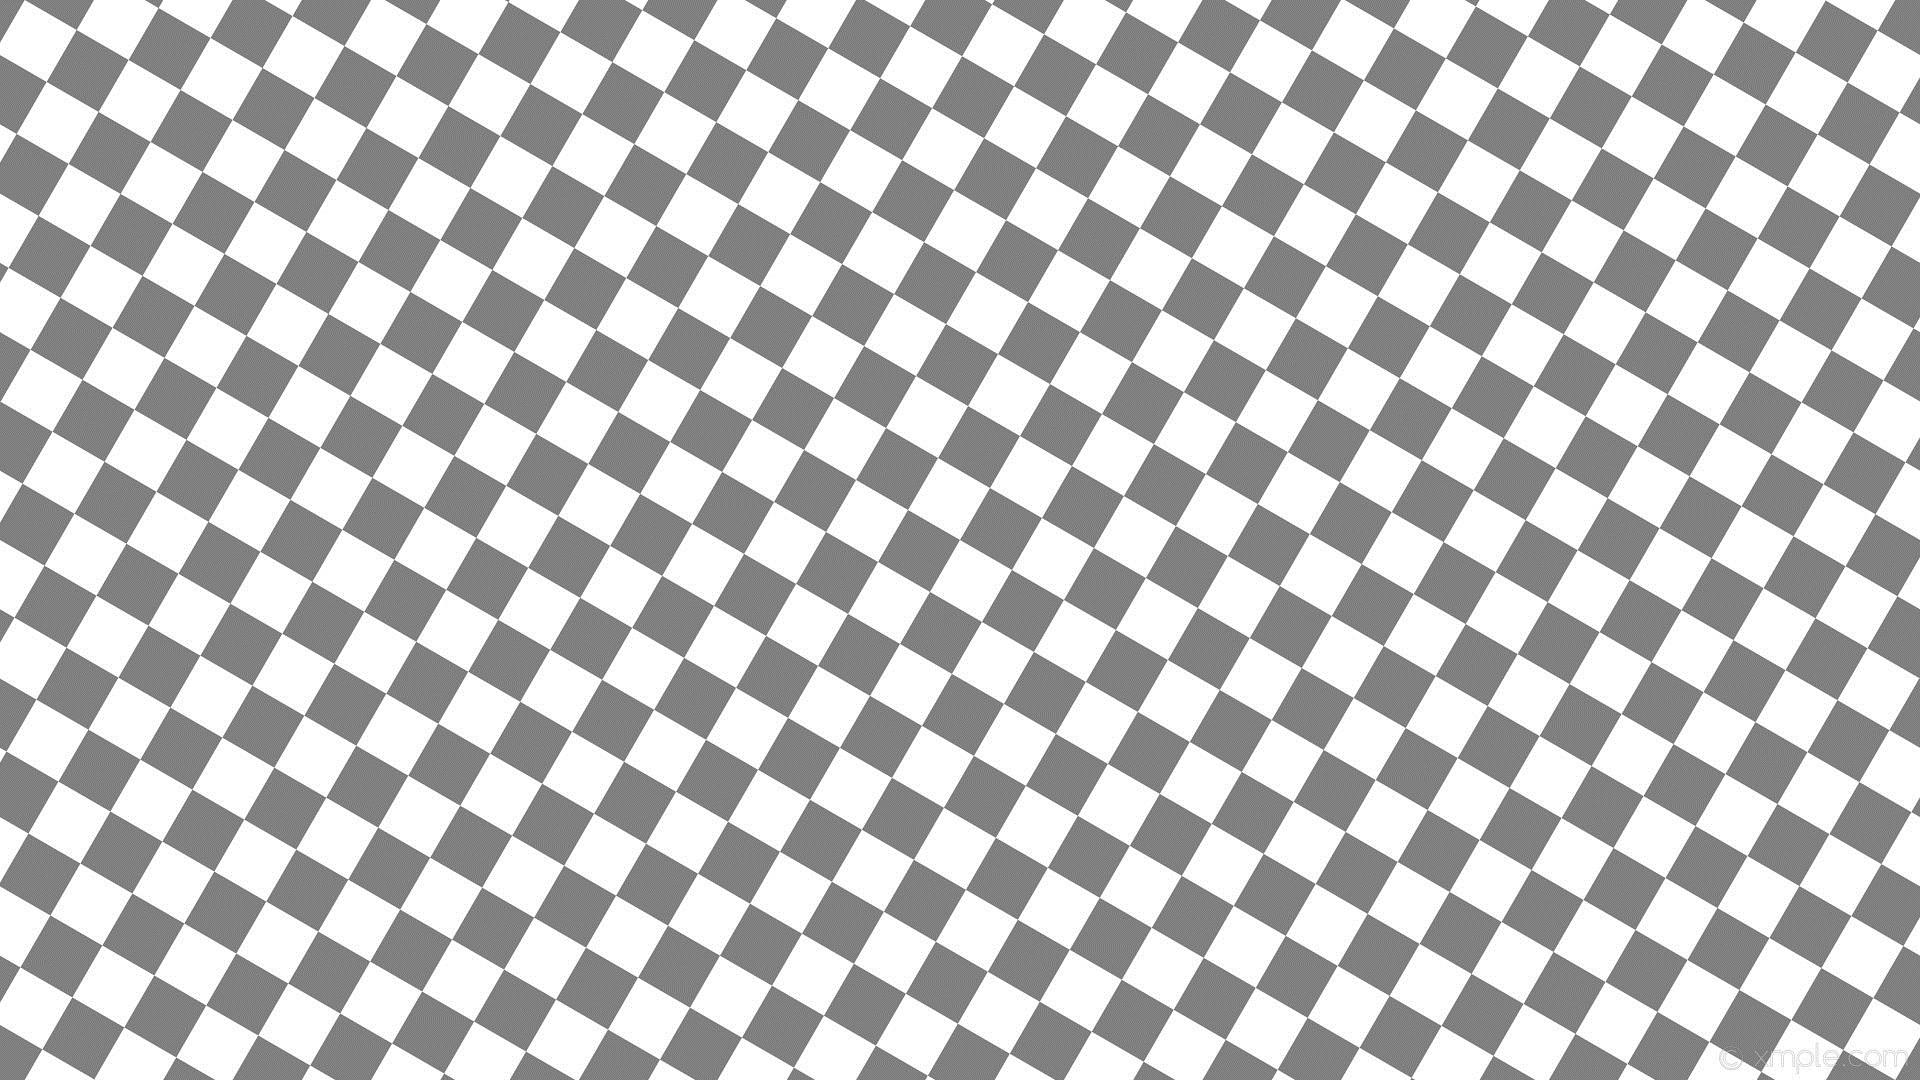 Checkerboard Desktop wallpaper